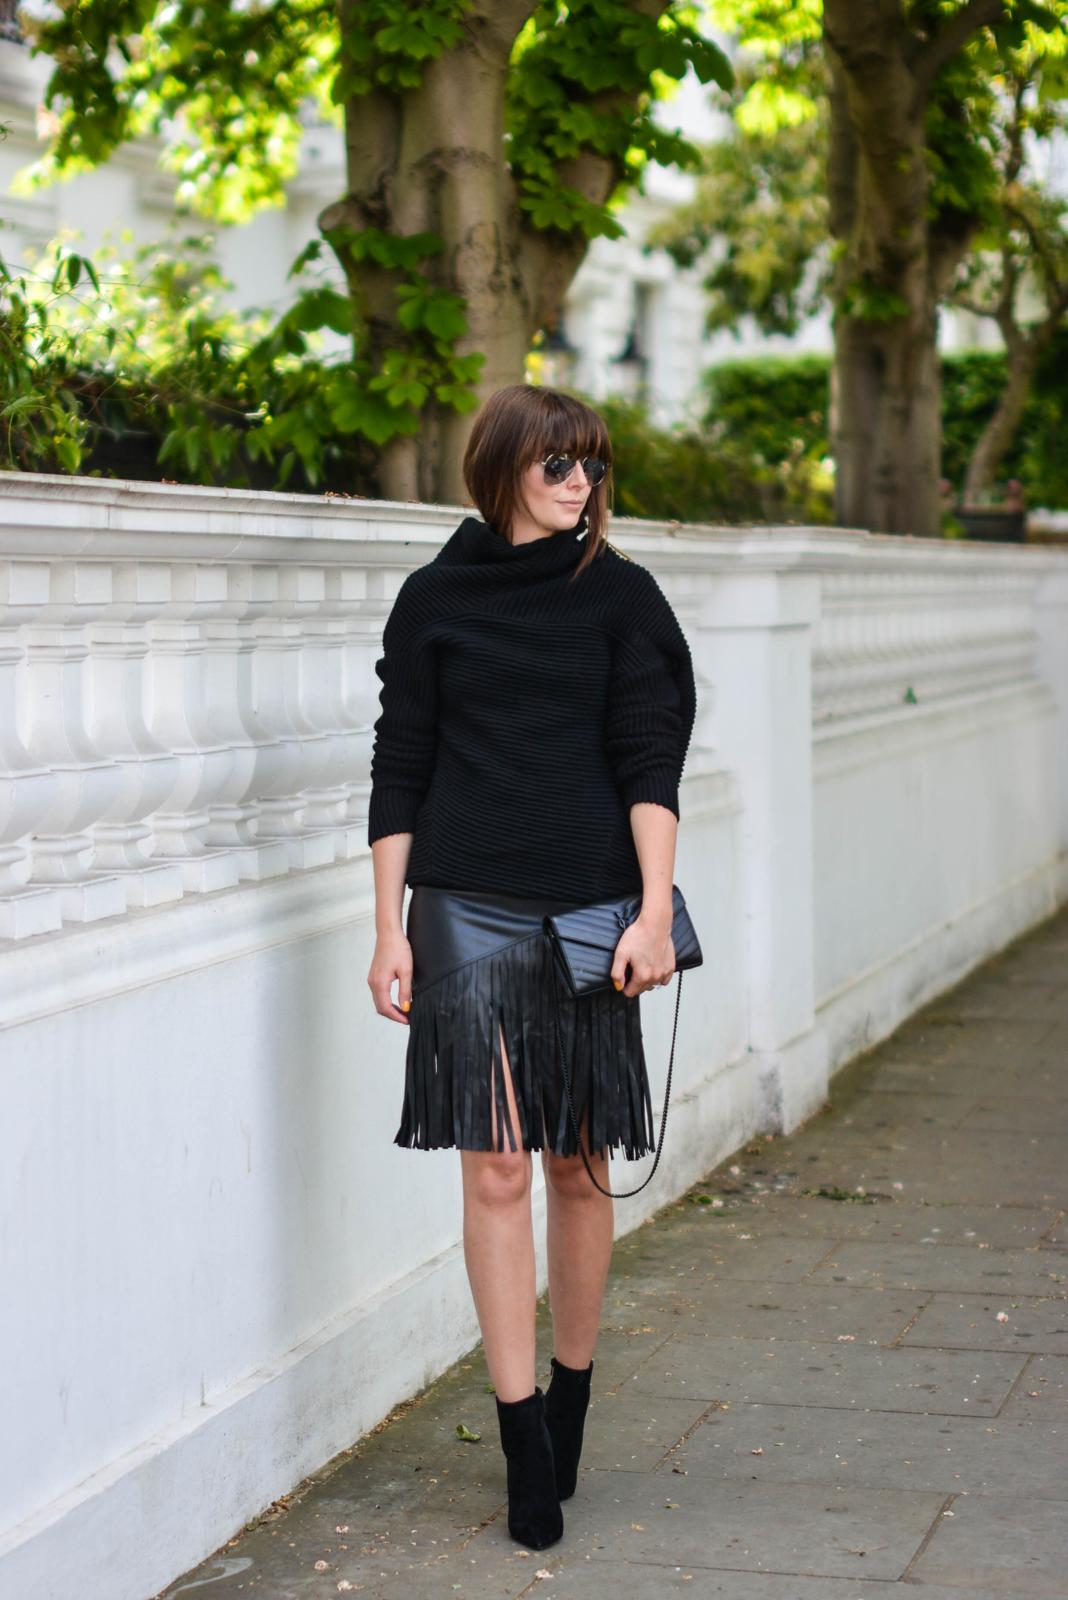 EJSTYLE - Emma Hill wears River Island faux leather fringe tassel skirt, Romwe black jumper, heeled ankle boots, YSL quilted envelope clutch bag, all black OOTD